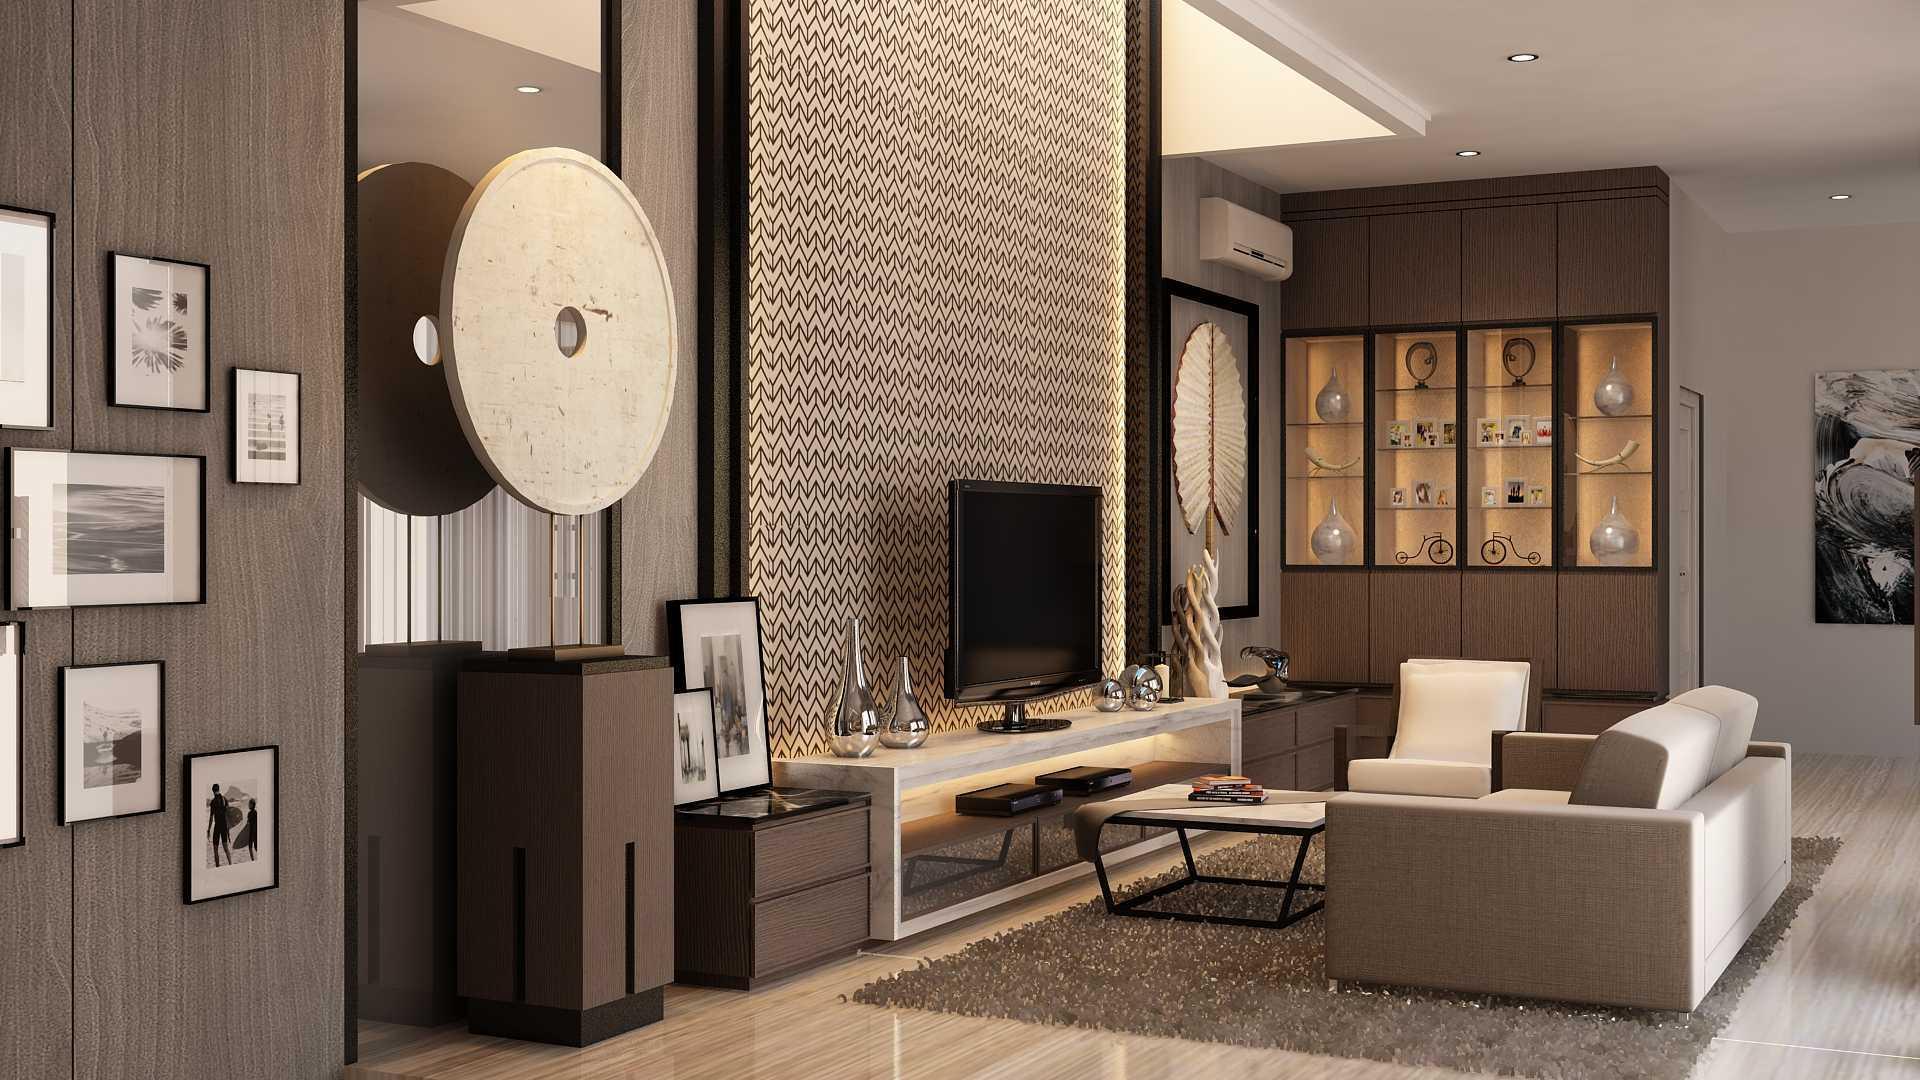 Simplifica Interior Contemporary House Surabaya, Kota Sby, Jawa Timur, Indonesia Surabaya, Kota Sby, Jawa Timur, Indonesia Simplifica-Interior-Contemporary-House   62973